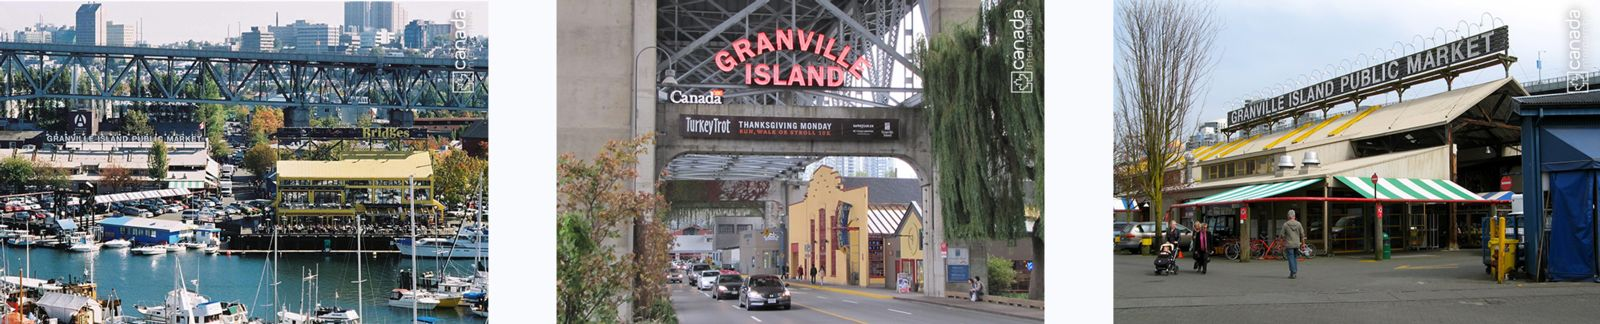 Ponto turistico em Vancouver, Granville Island